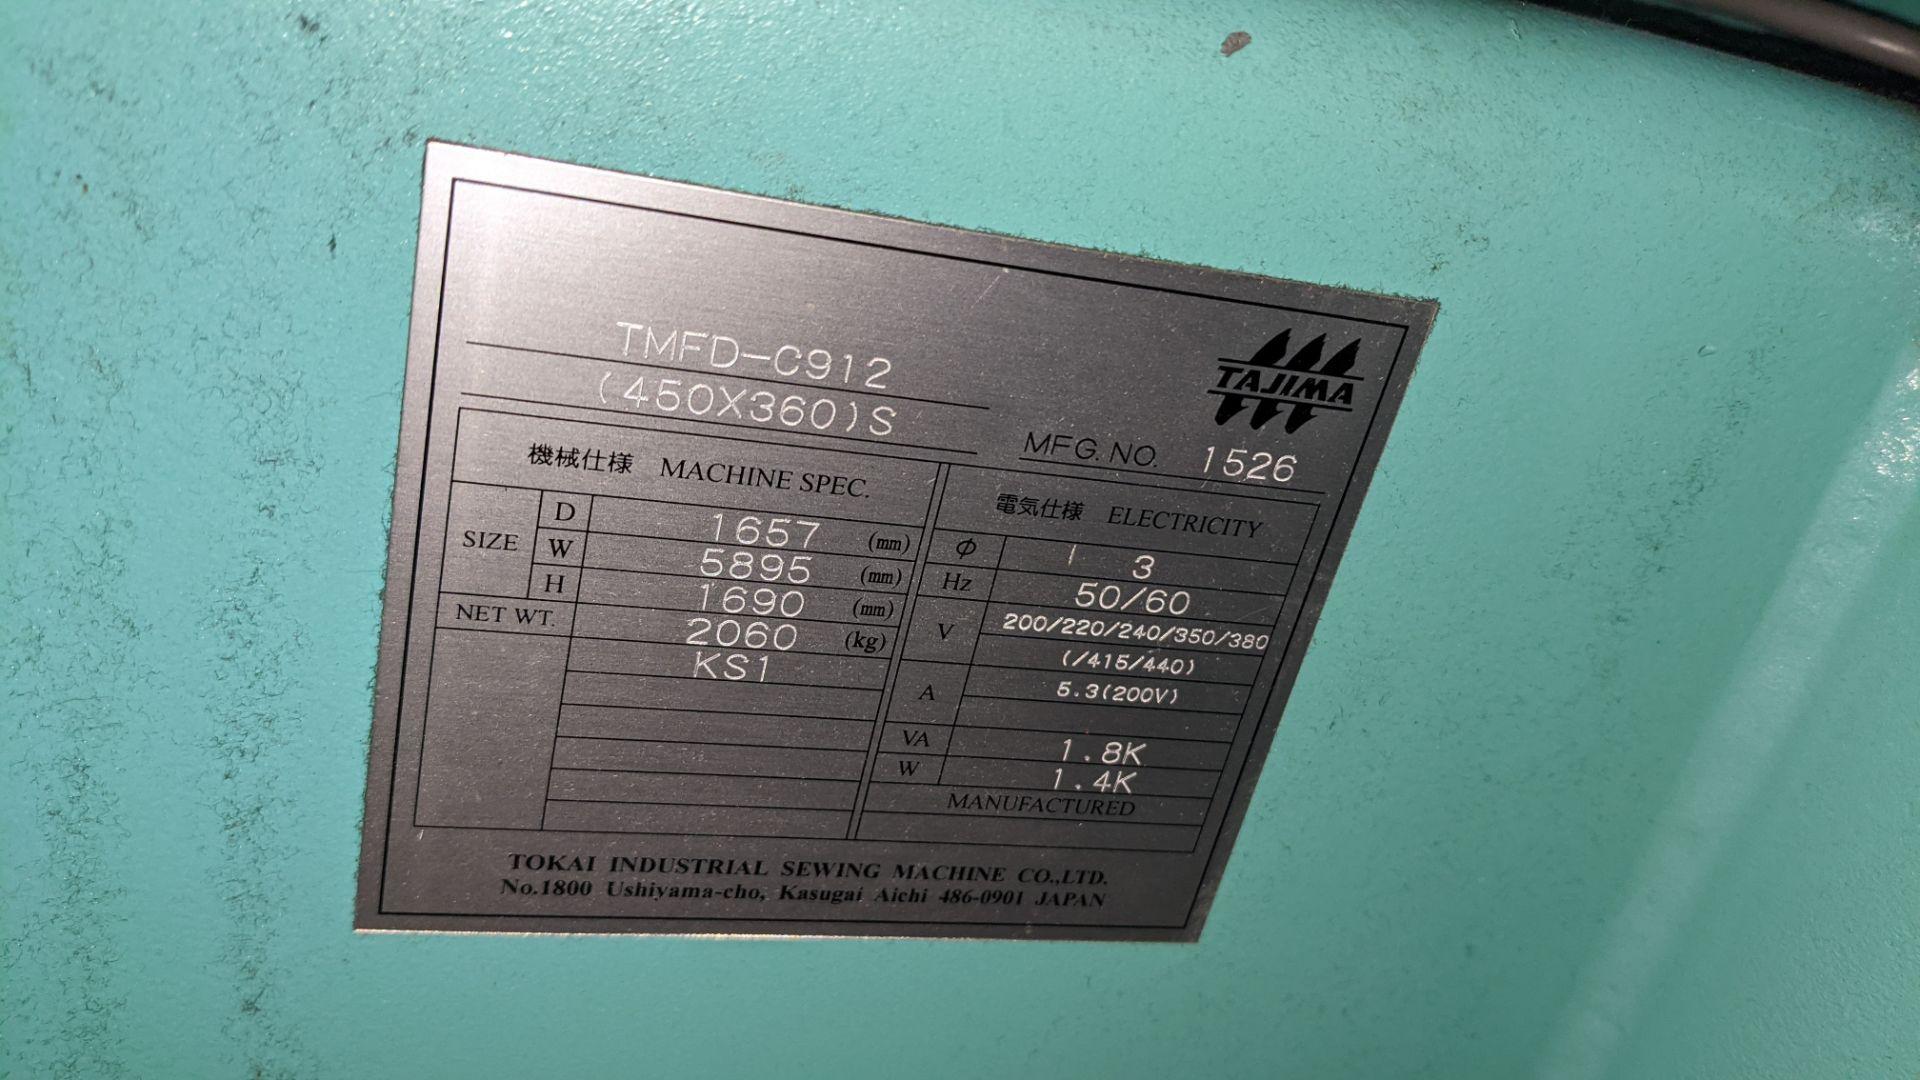 Tokai Tajima model TMFD-C912 electronic 12 head embroidery machine, type 2-2FX - Image 13 of 27